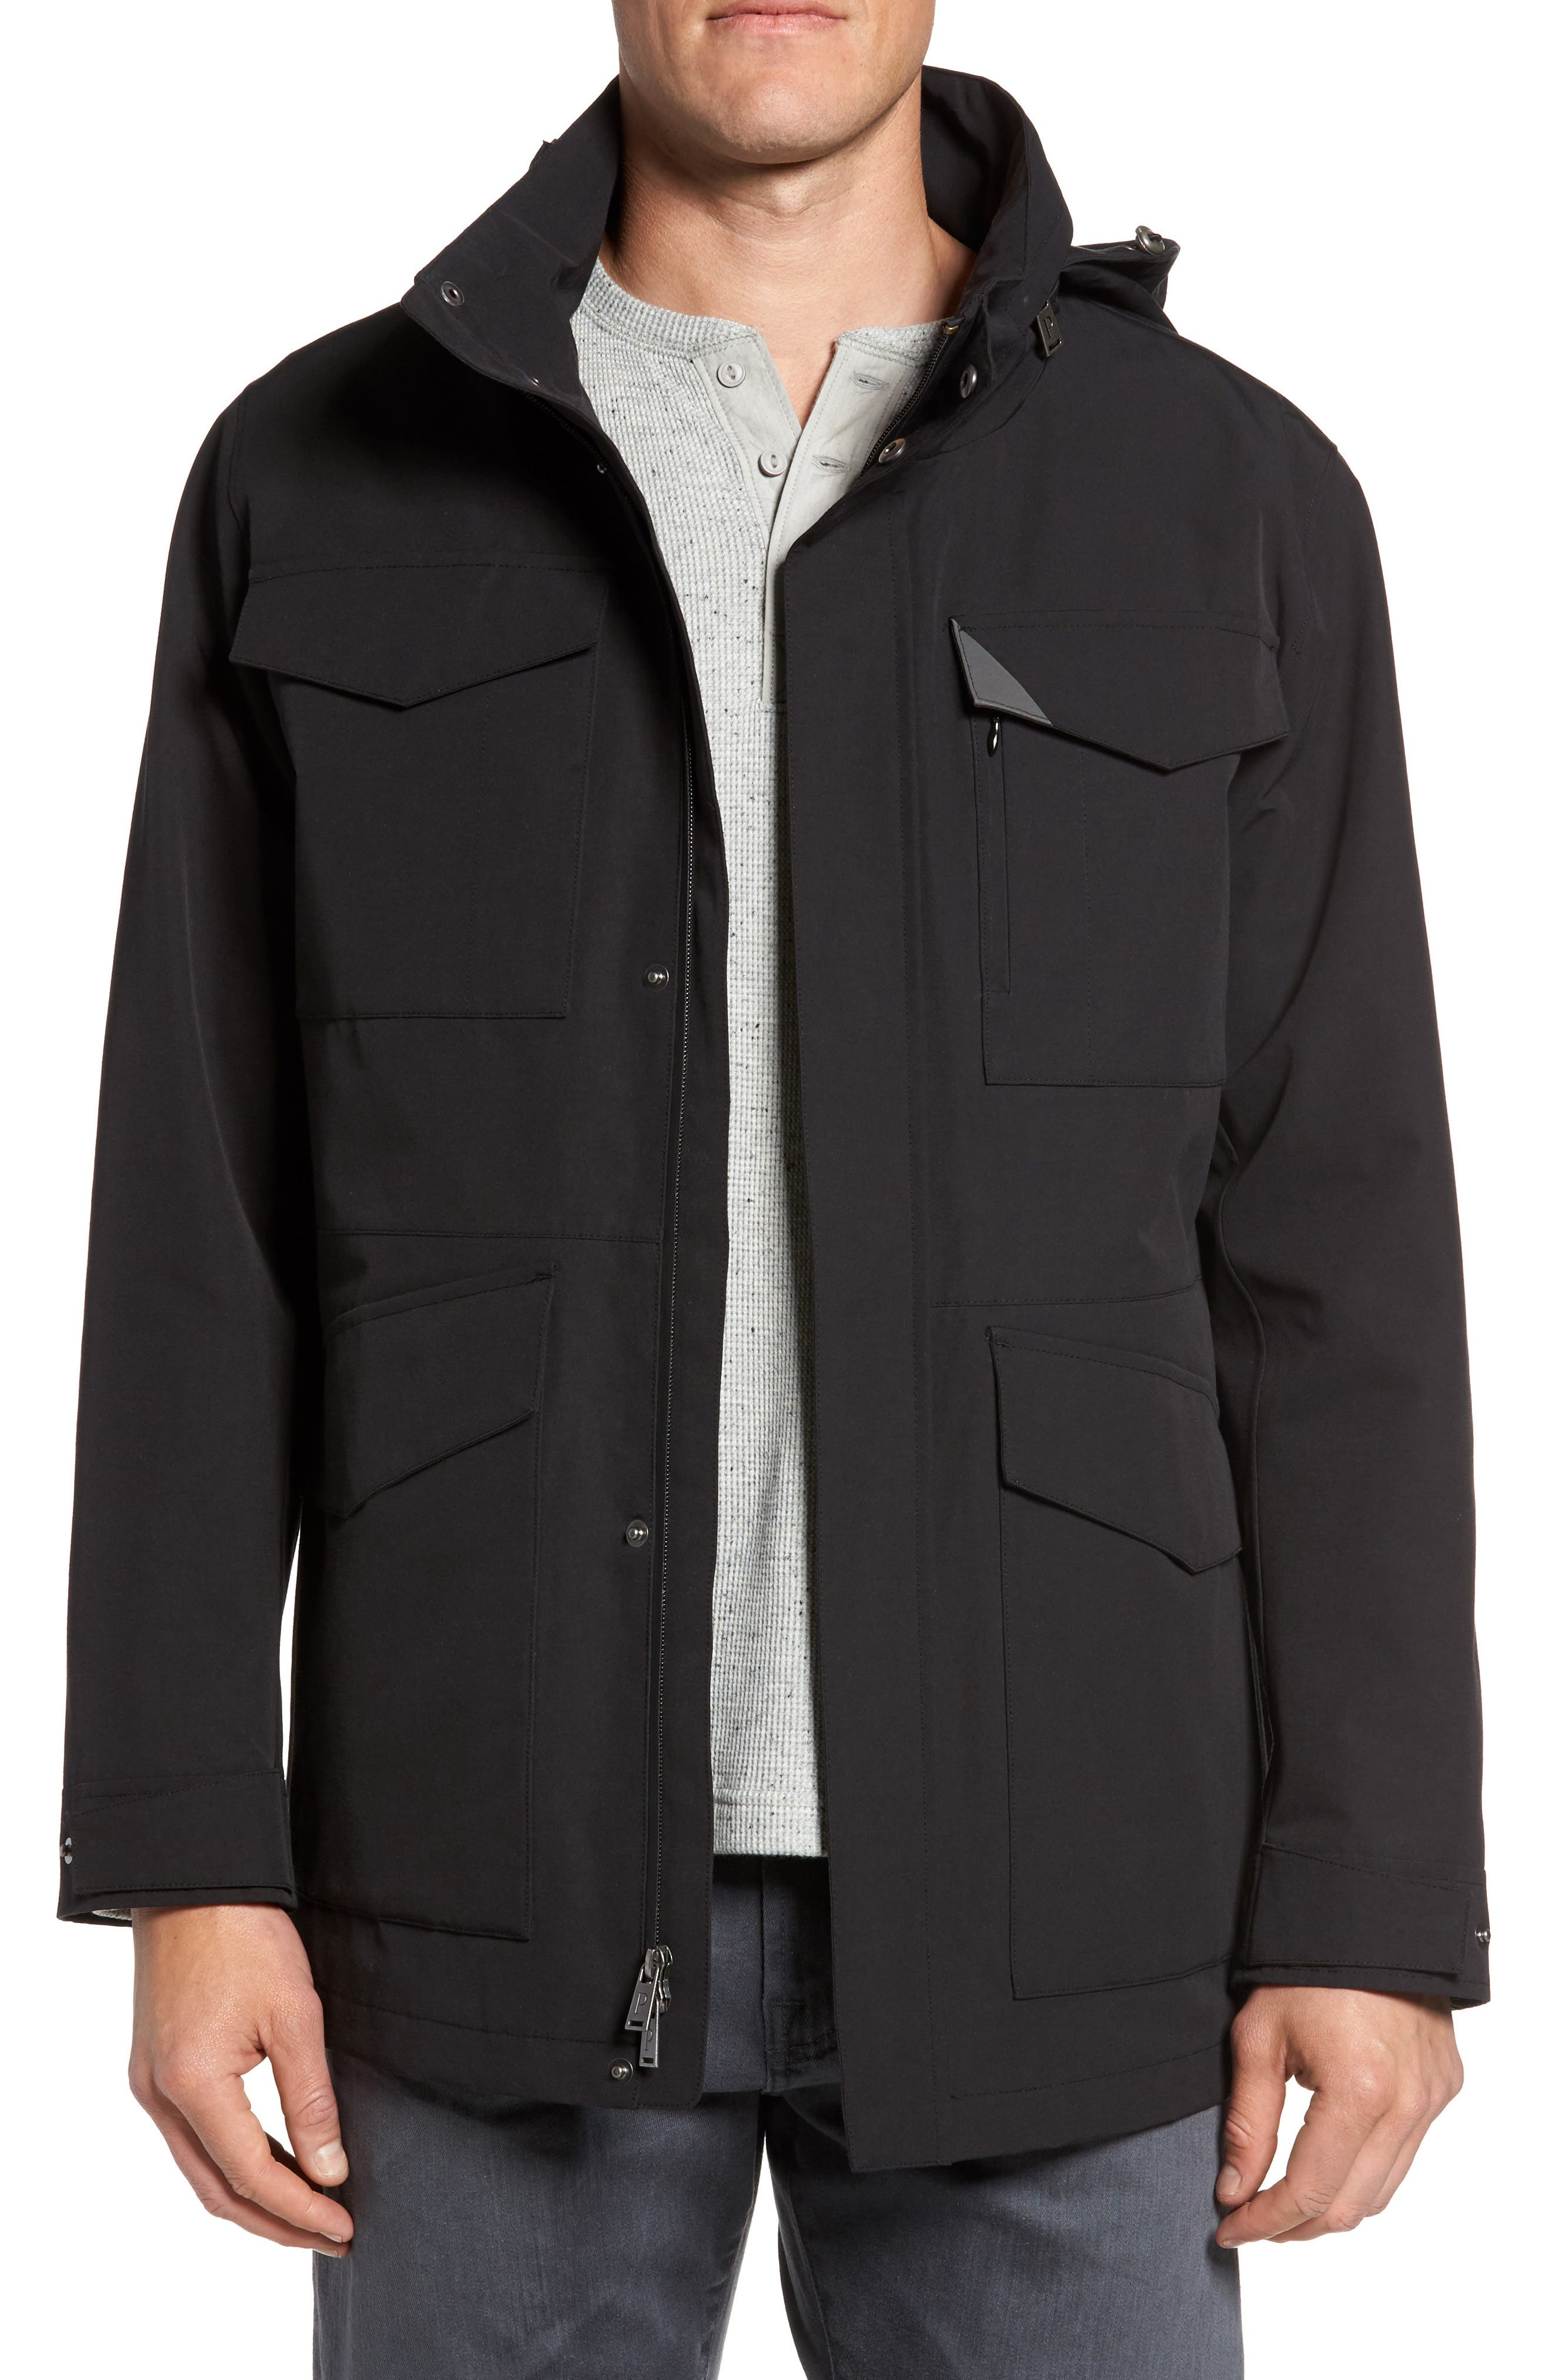 Clyde Hill Waterproof Field Jacket,                         Main,                         color, Black